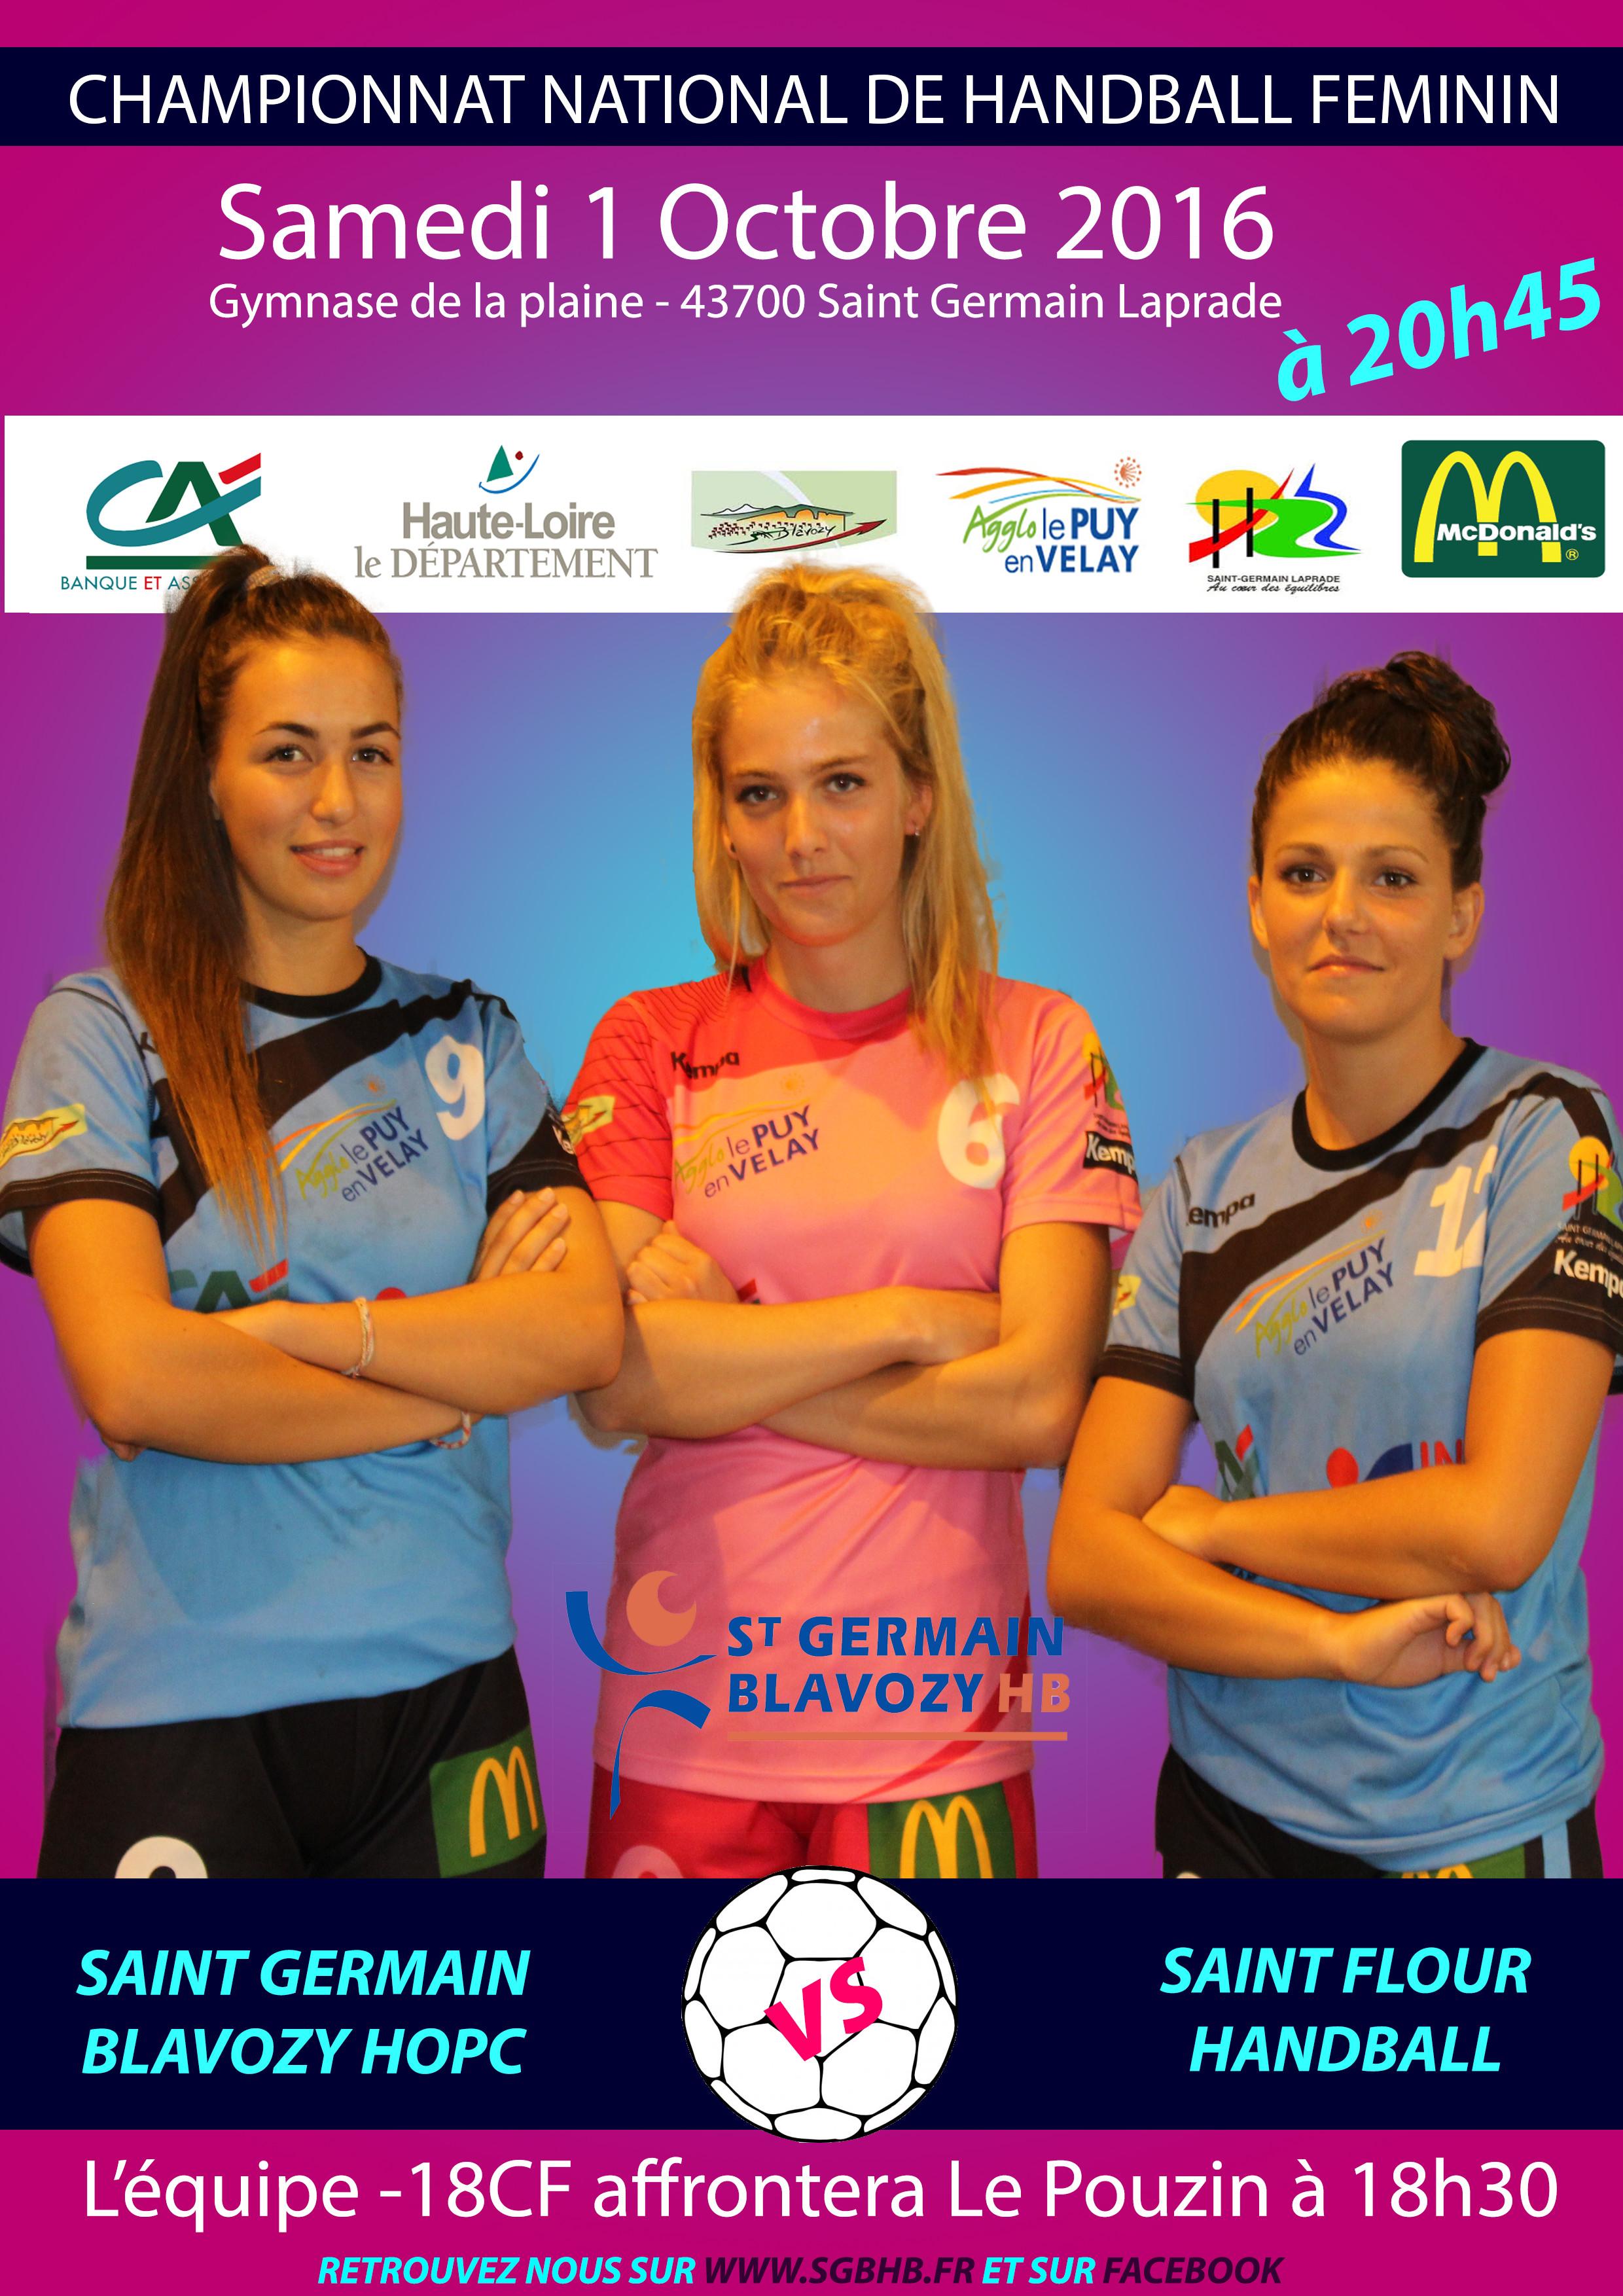 HAND BALL NATIONALE 3 FEMININE ST GERMAIN BLAVOZY – ST FLOUR 01/10/16 20H45